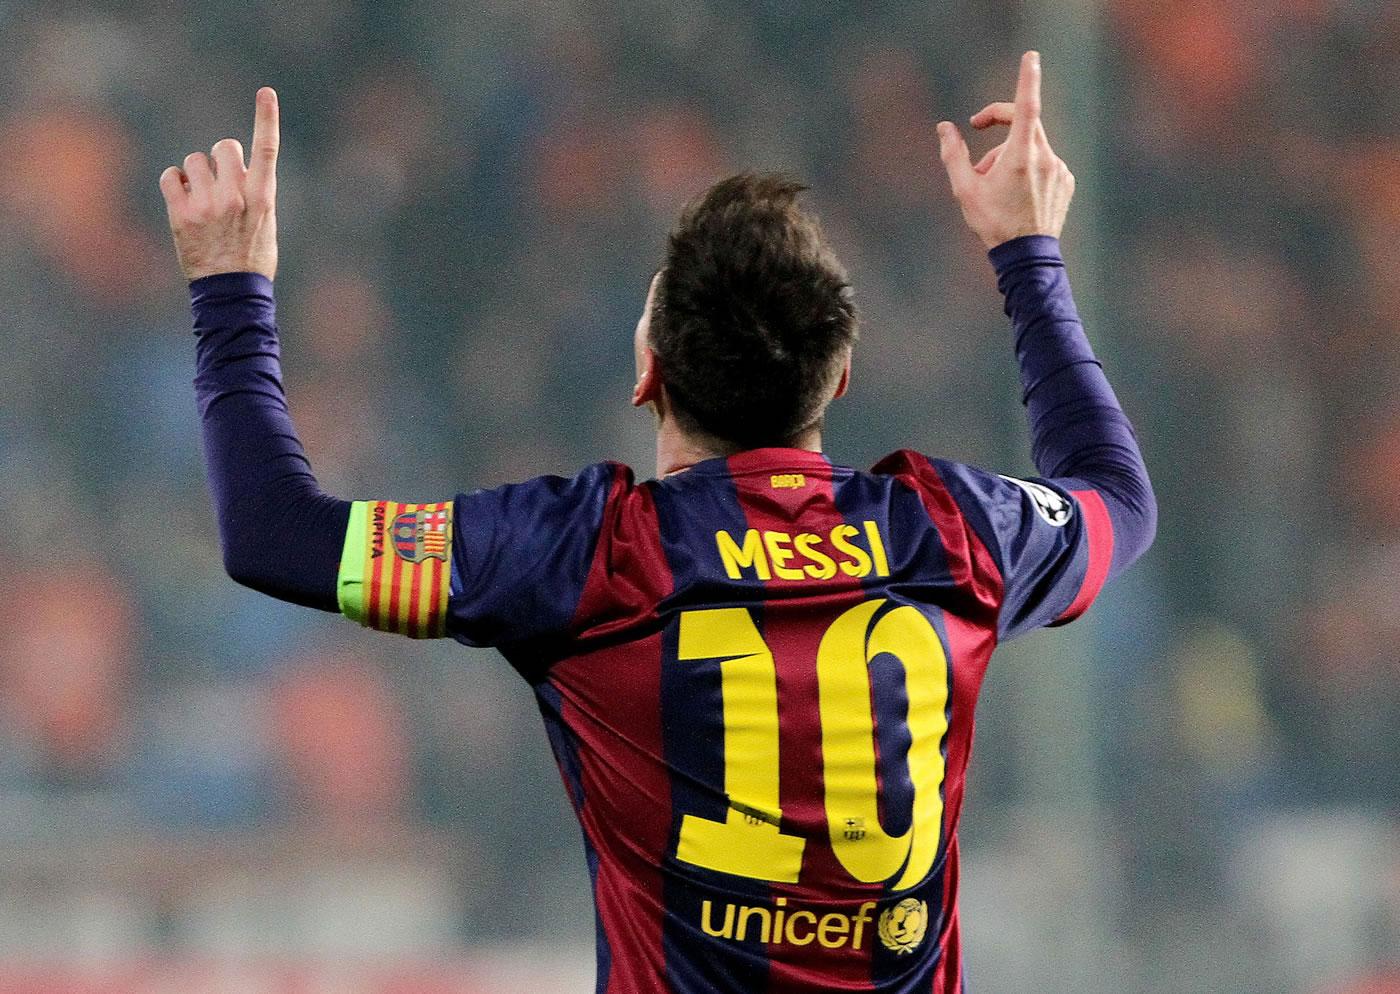 Messi, nuevo triplete y récord histórico